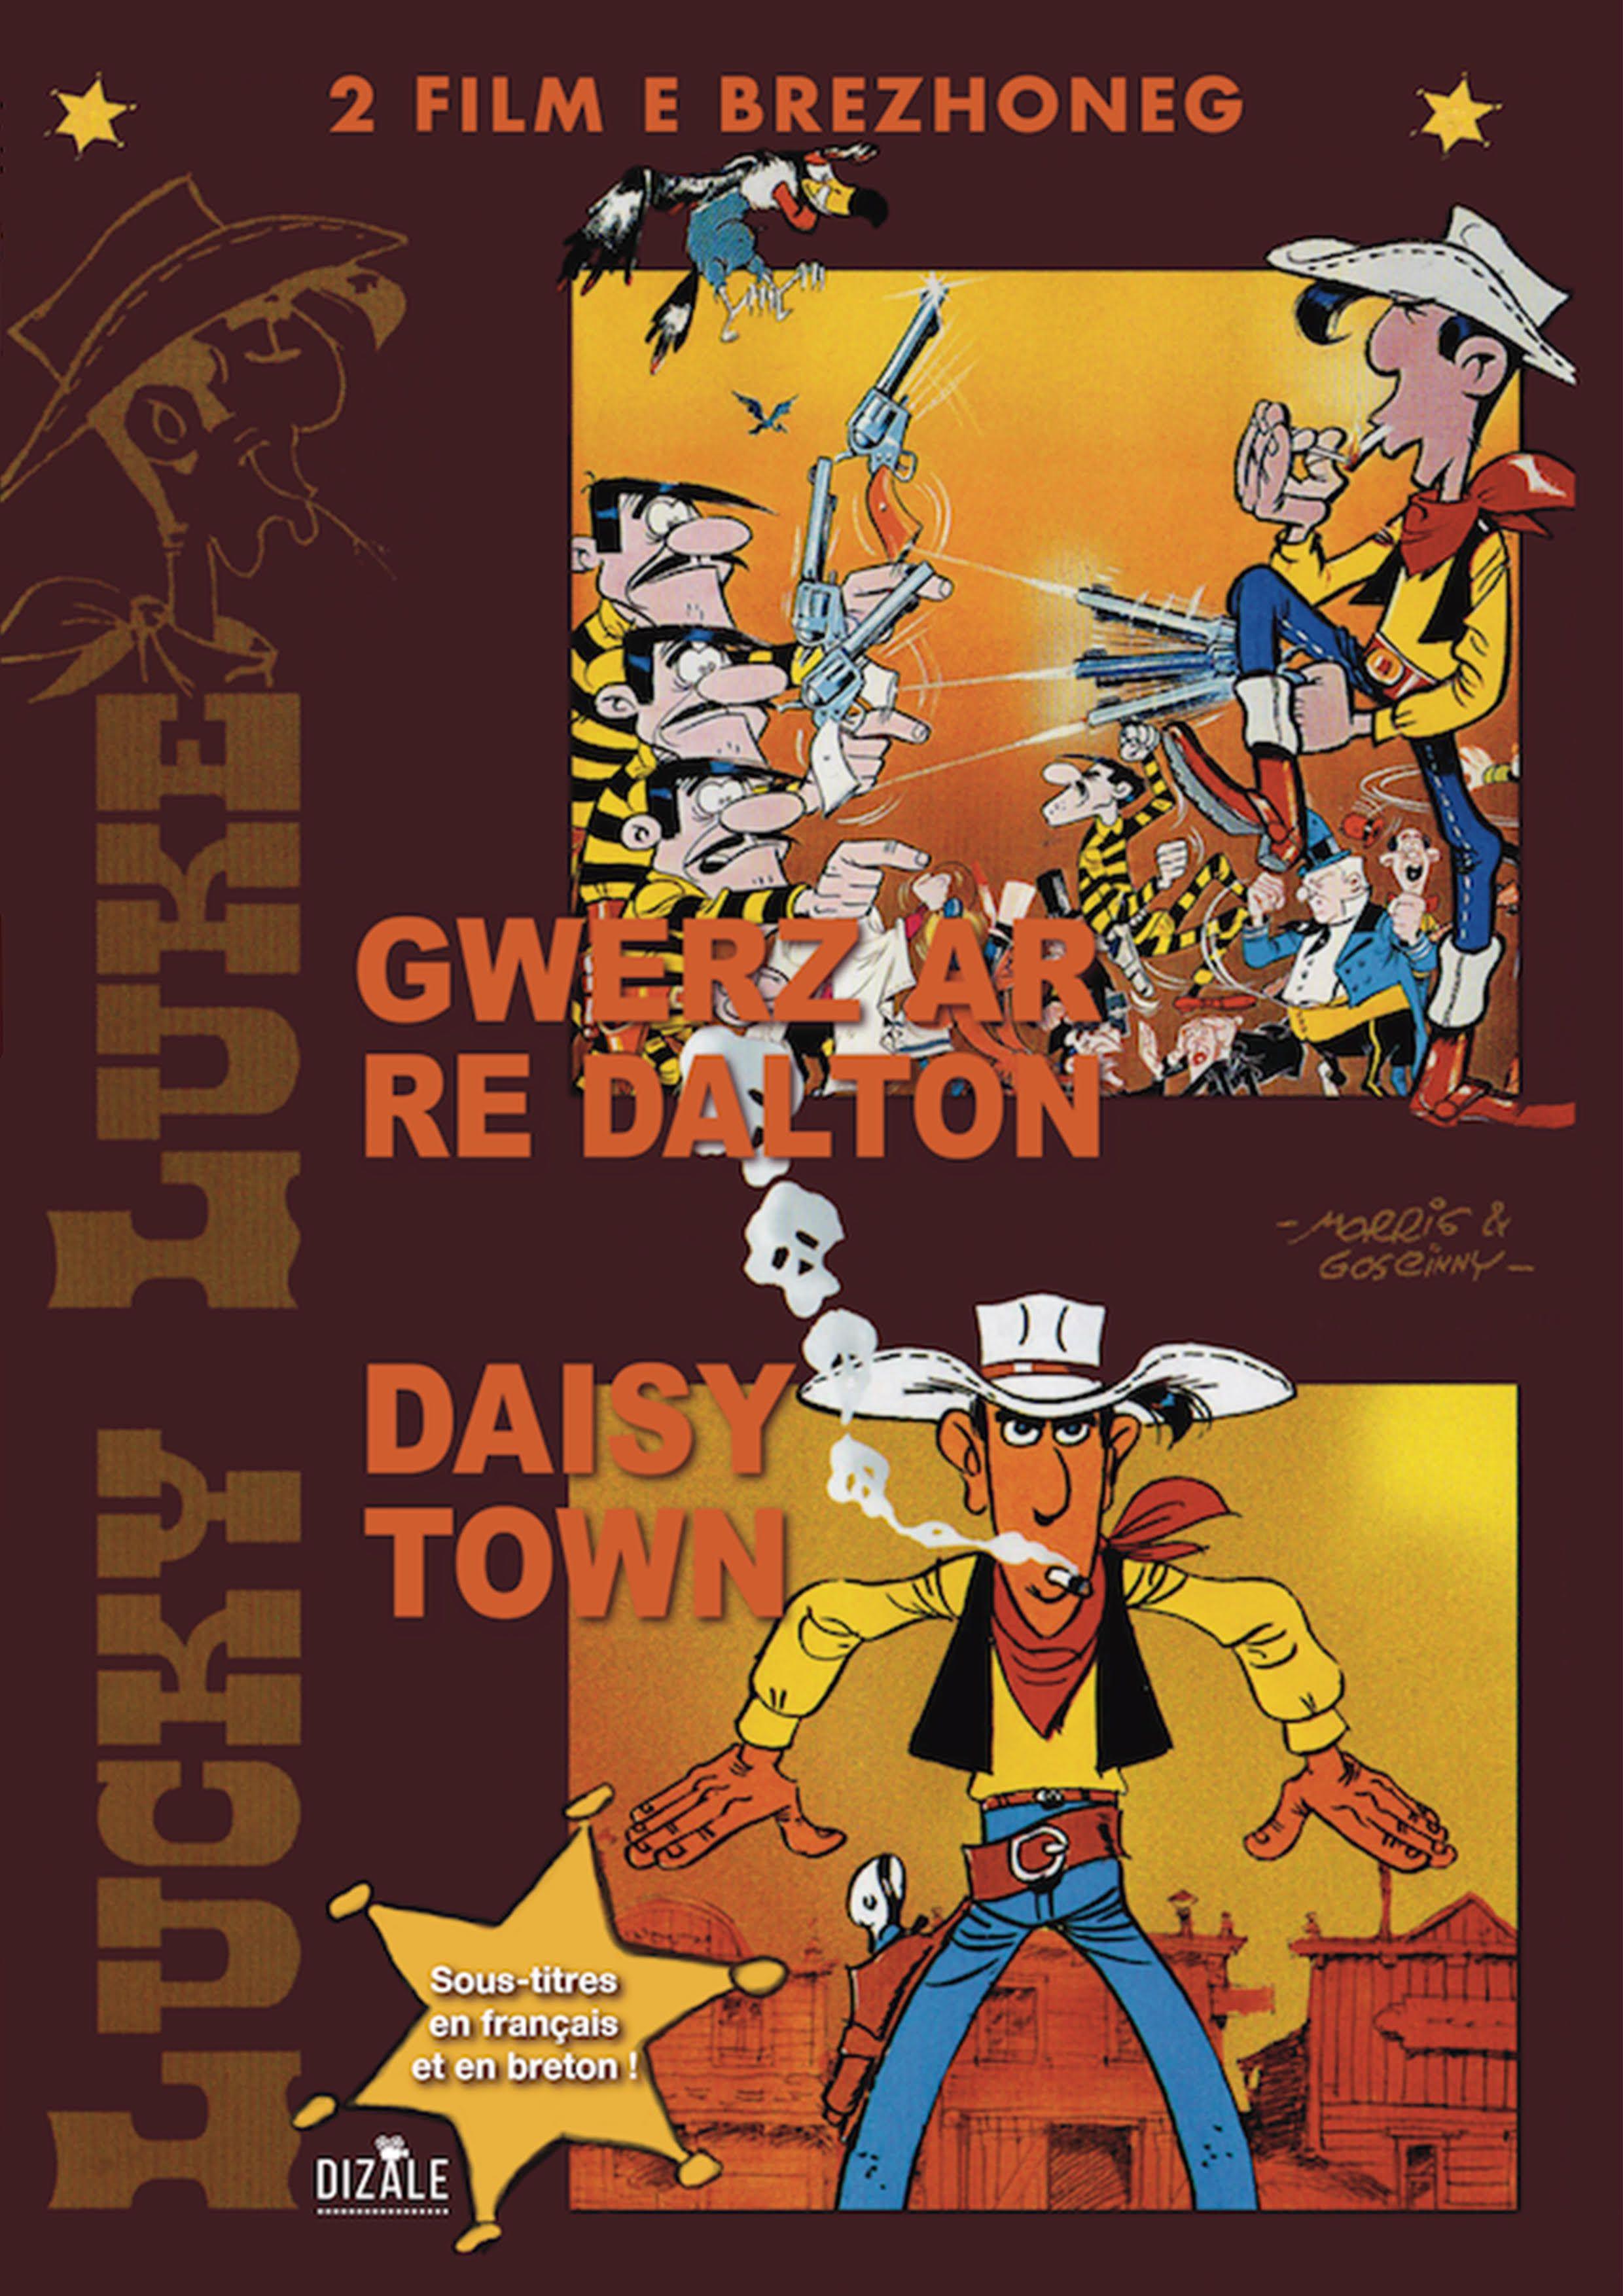 La ballade des Dalton & Daisy Town